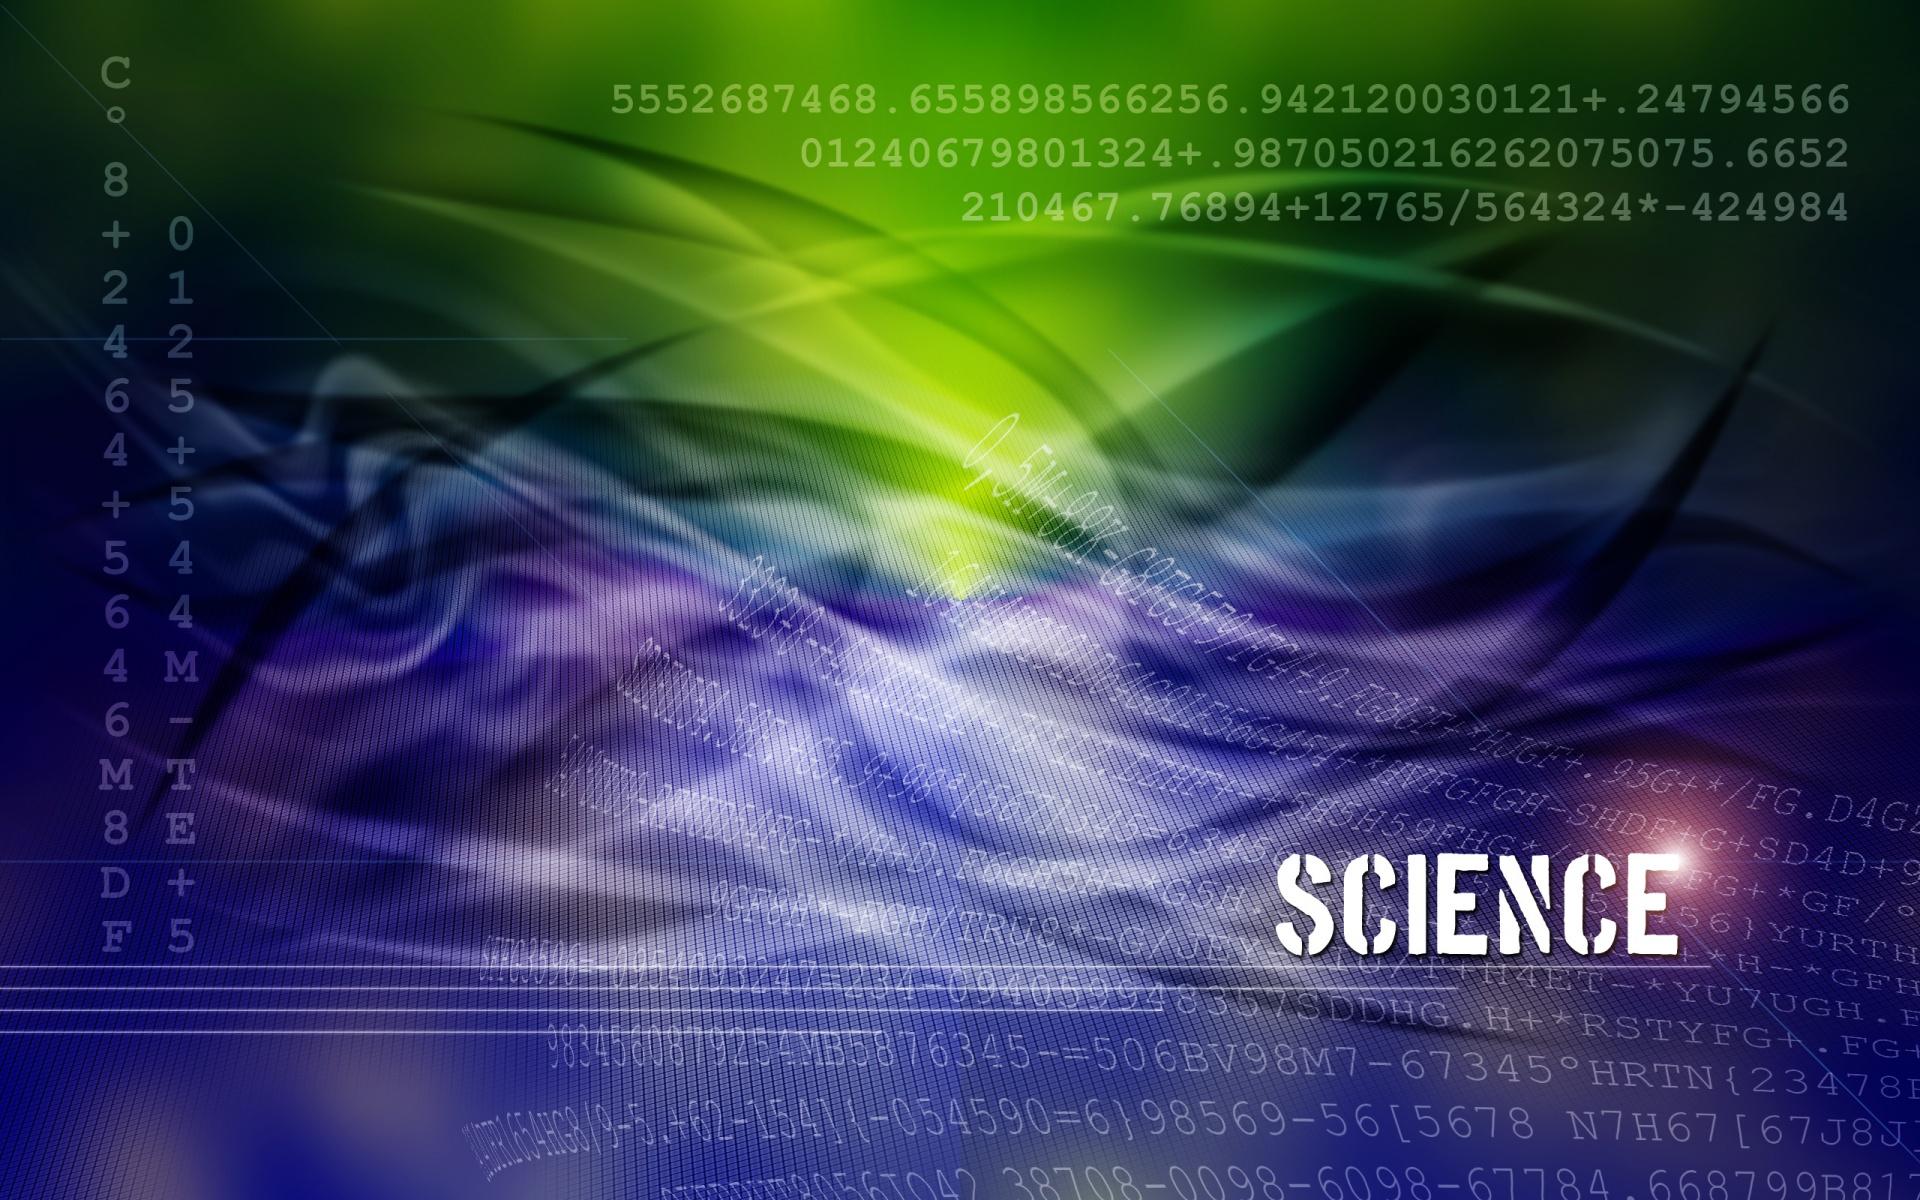 1920x1200 Science desktop PC and Mac wallpaper 1920x1200